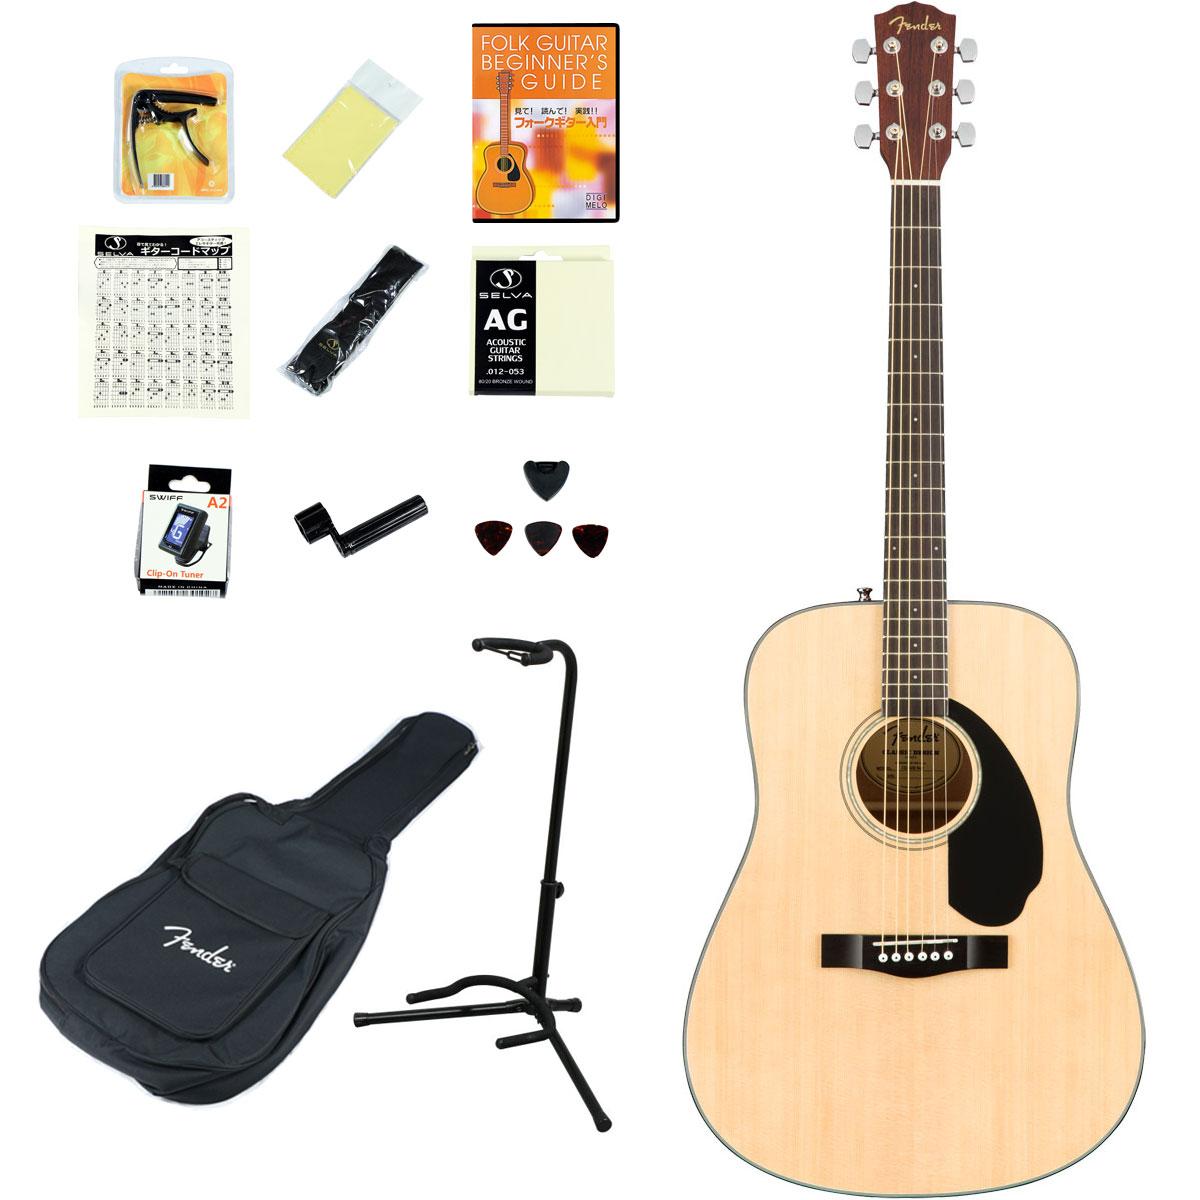 Classic Designシリーズのアコギ 初心者セット Fender Acoustic 安心と信頼 CD-60S Dreadnought Natural WN アコースティックギター14点入門セット お求めやすく価格改定 YRK アコースティックギター アコギ CD60S フェンダー 入門 初心者 フォークギター 単板Top